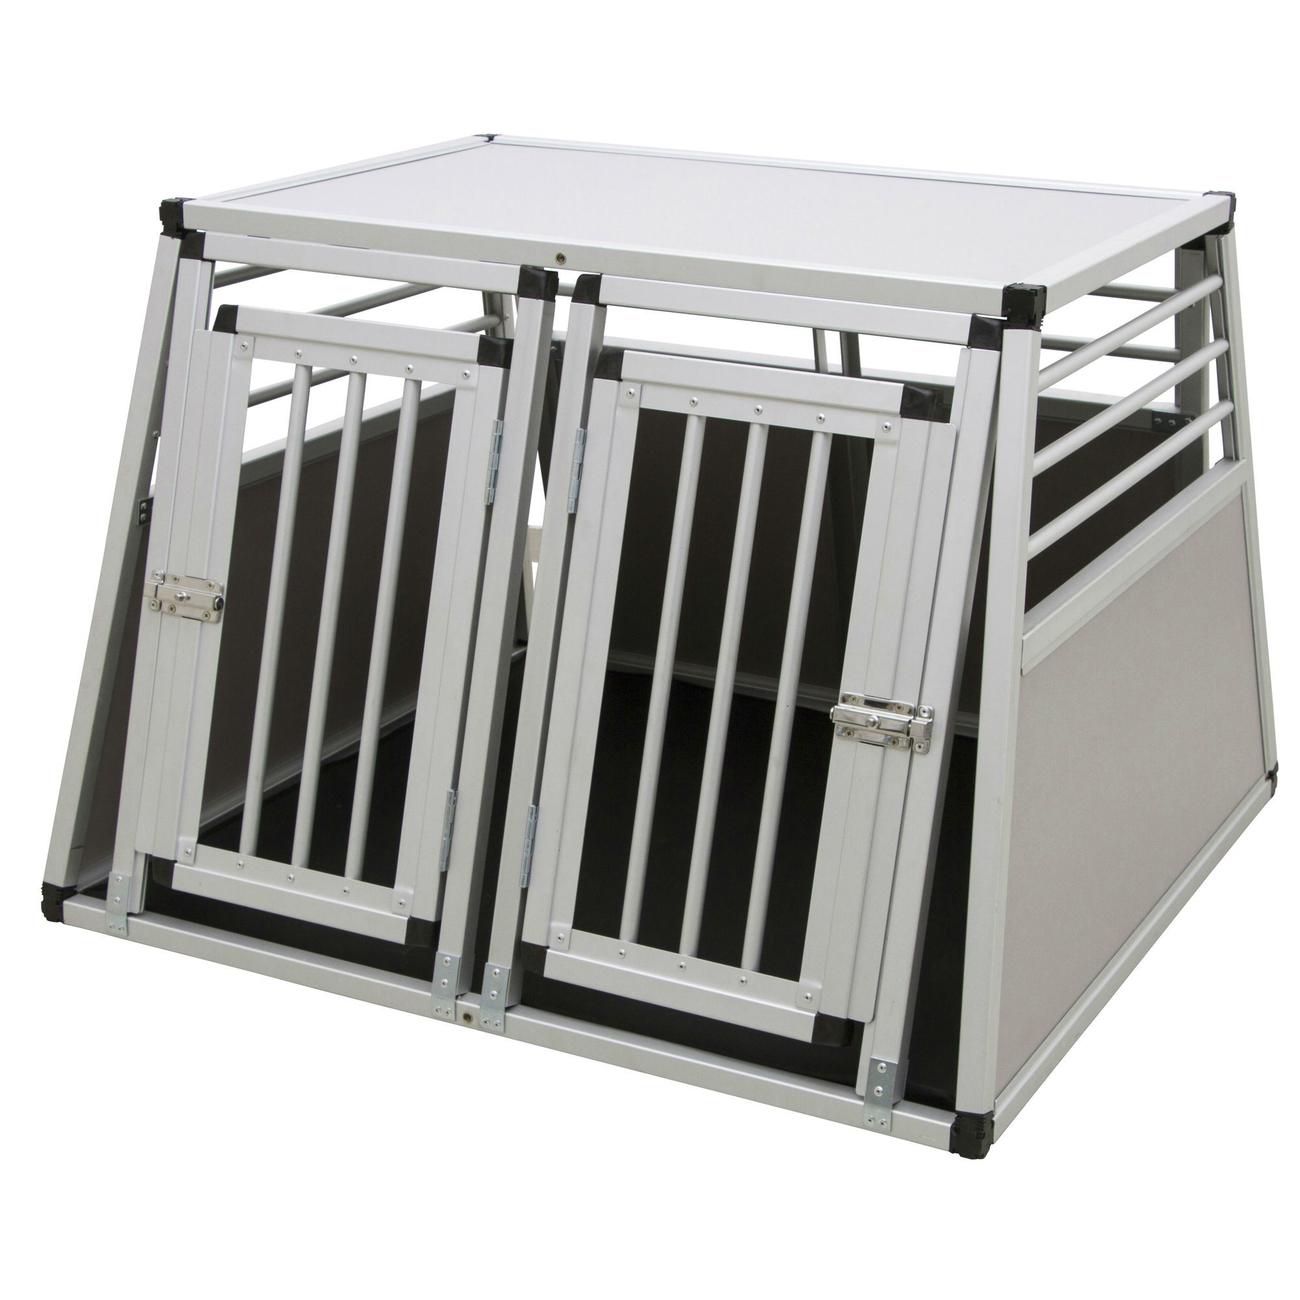 Kerbl Alu-Transportbox Barry zweitürig Preview Image